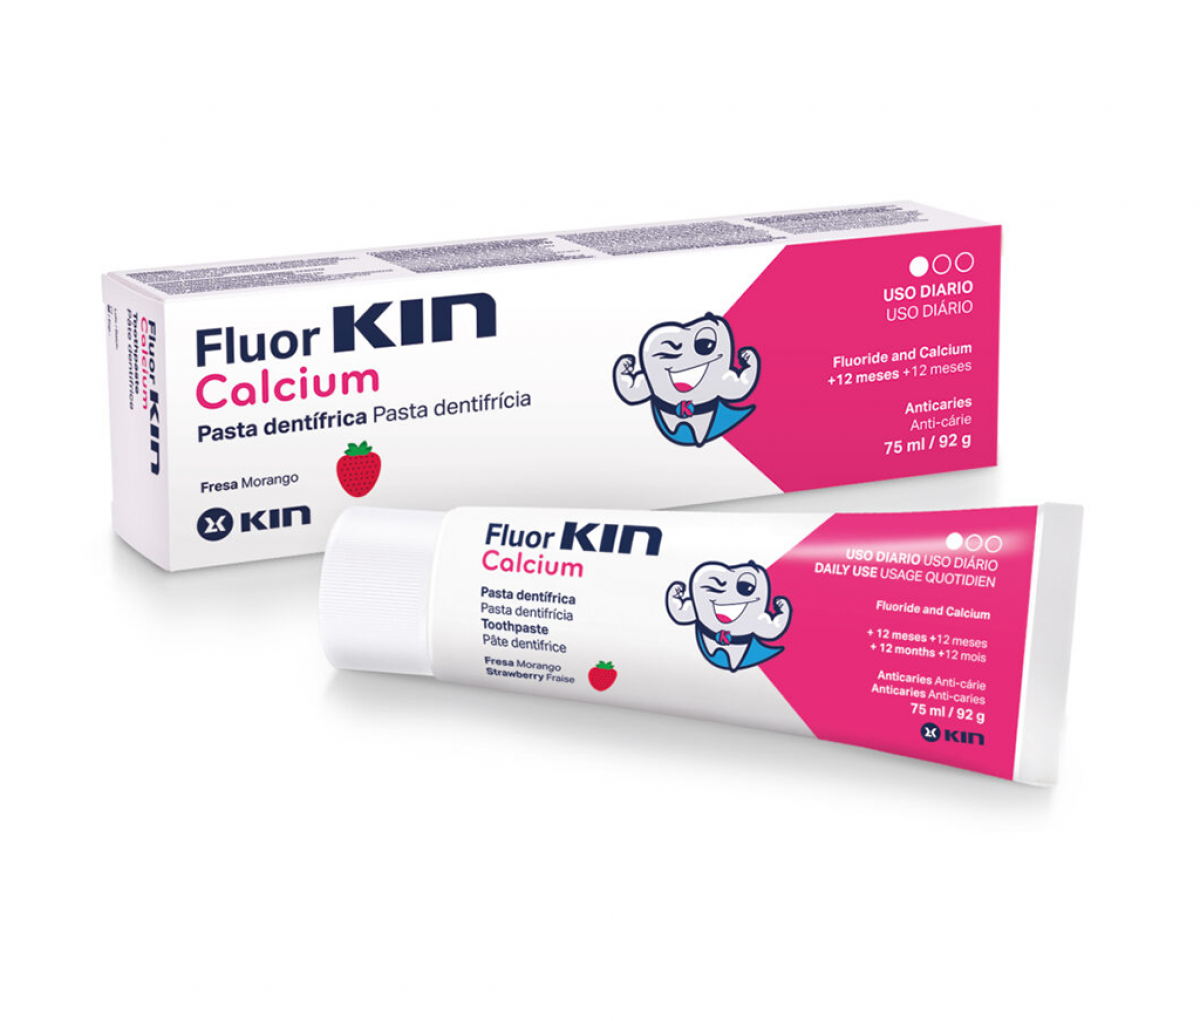 KIN Fluorkin Calcium Toothpaste for Children